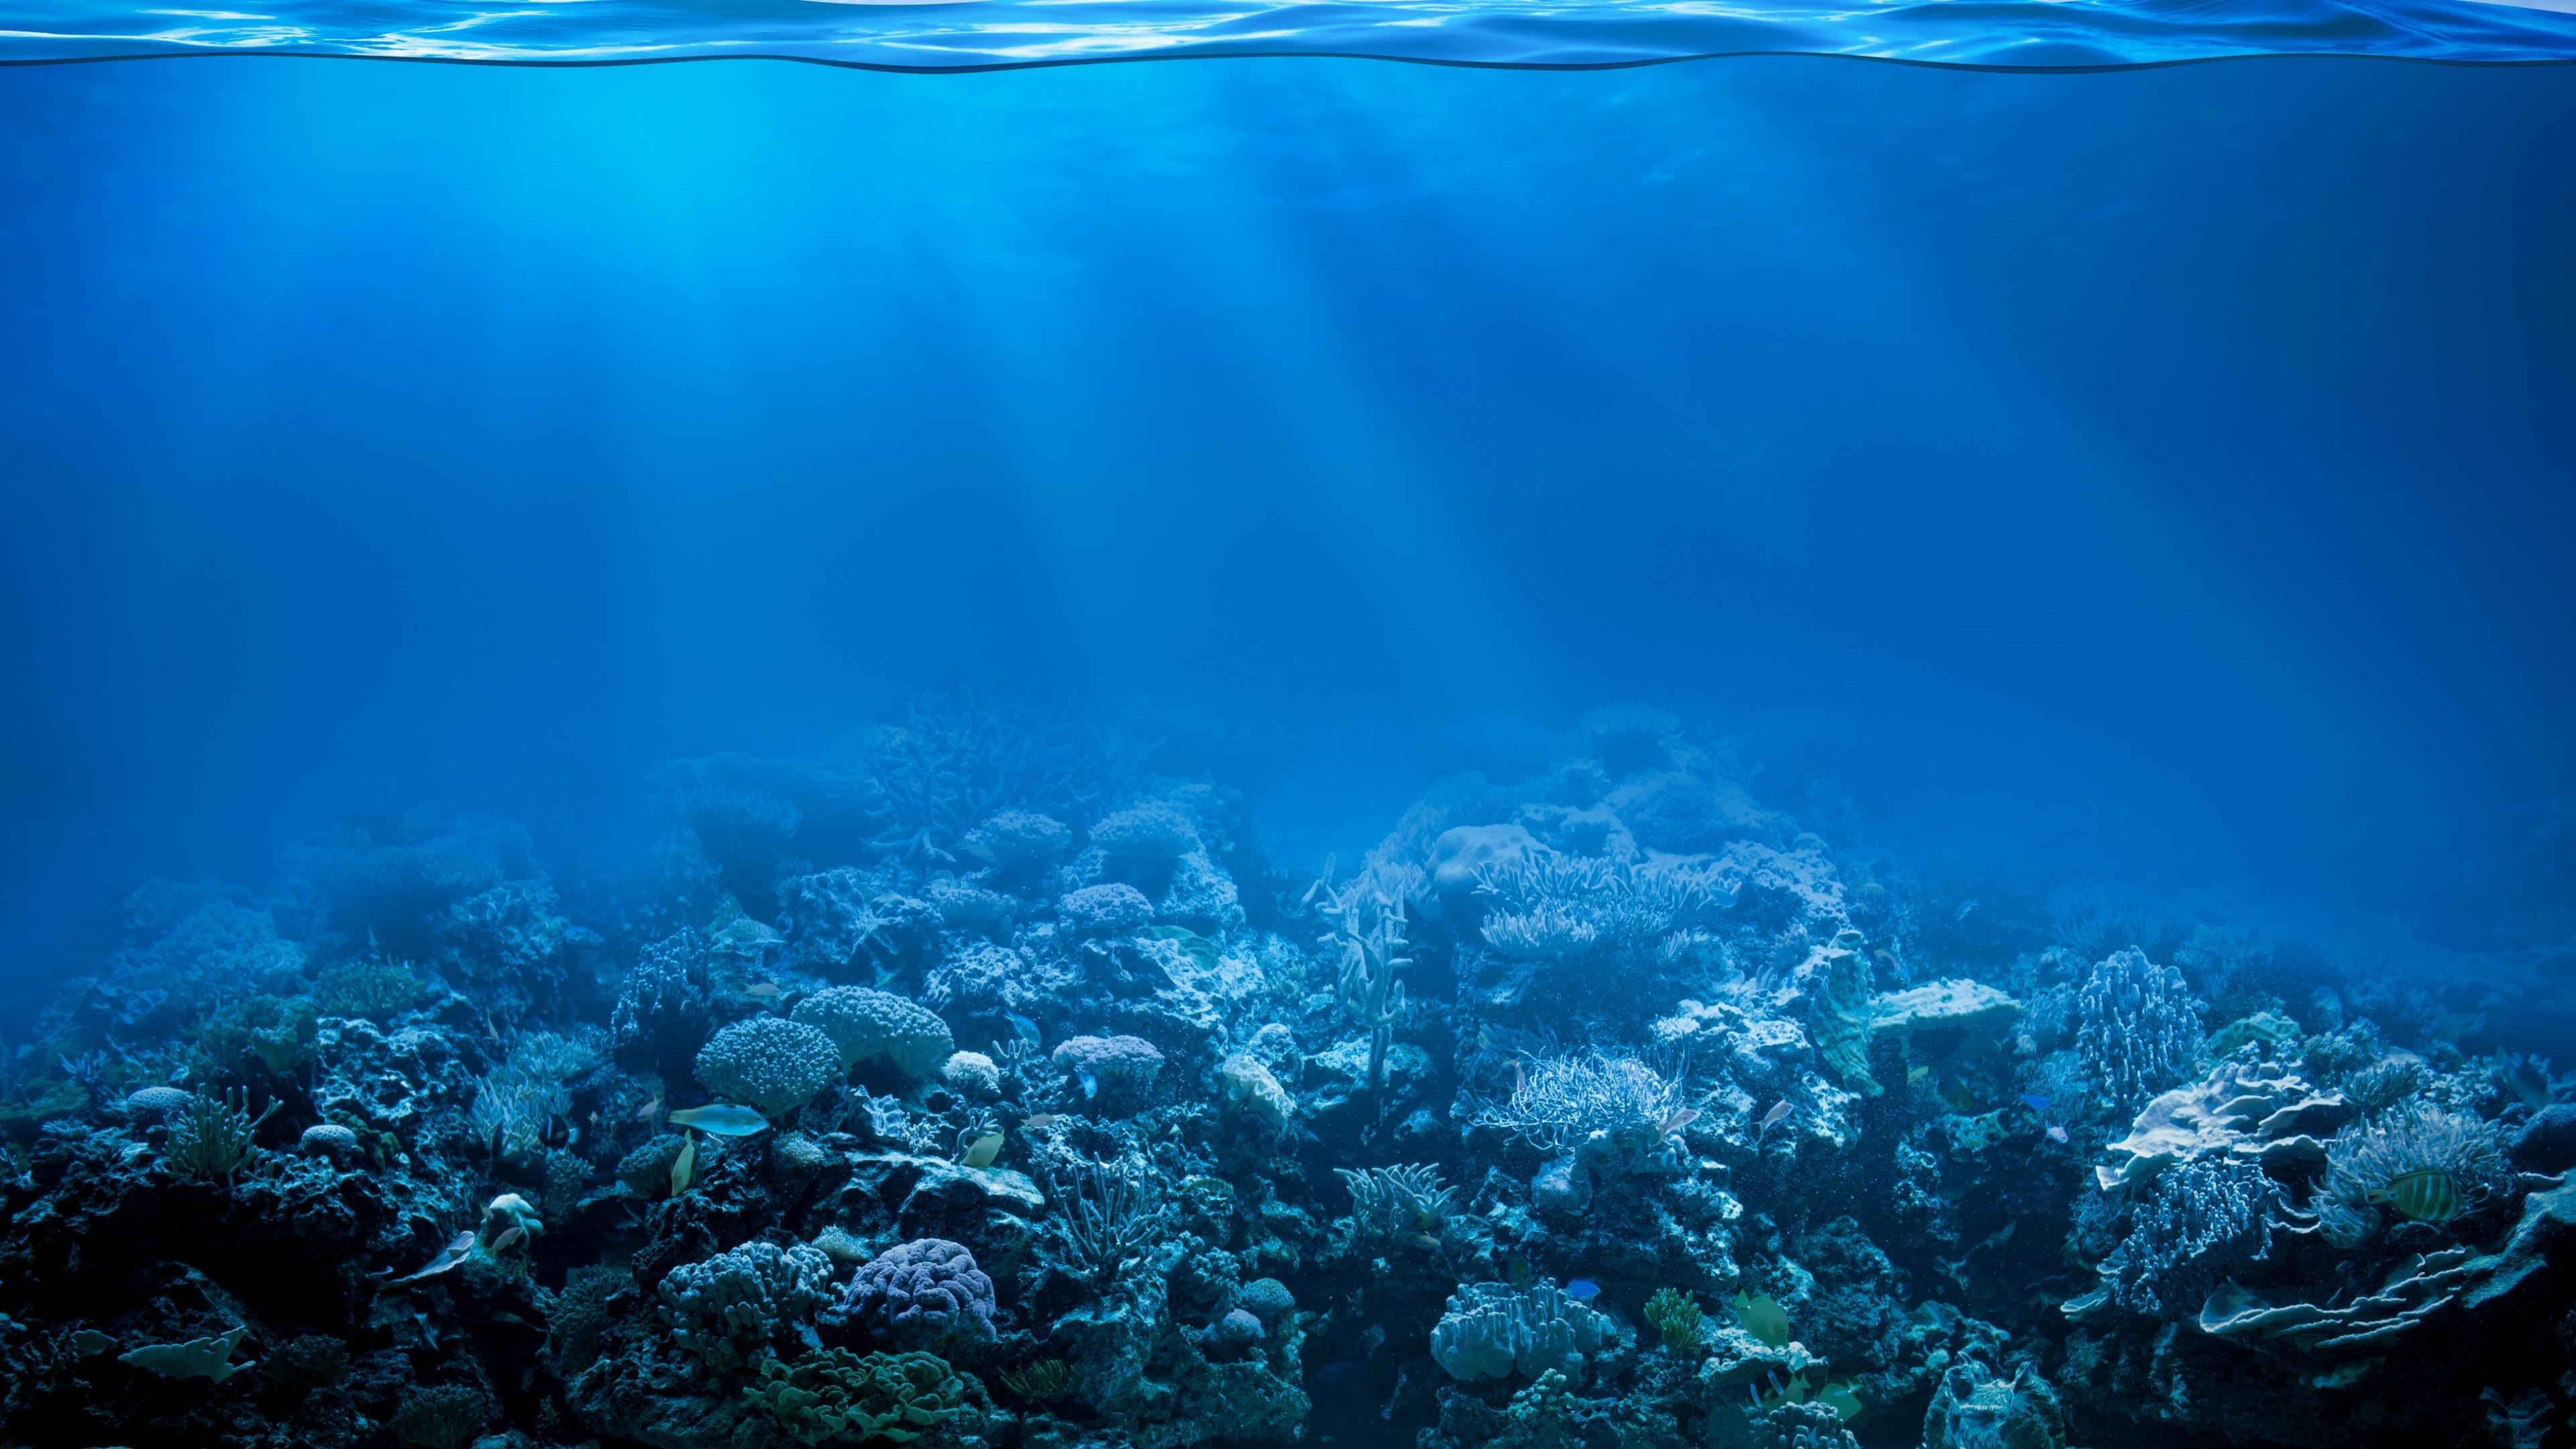 Underwater wallpapers 3840x2160 ultra hd 4k desktop - Underwater wallpaper for pc ...